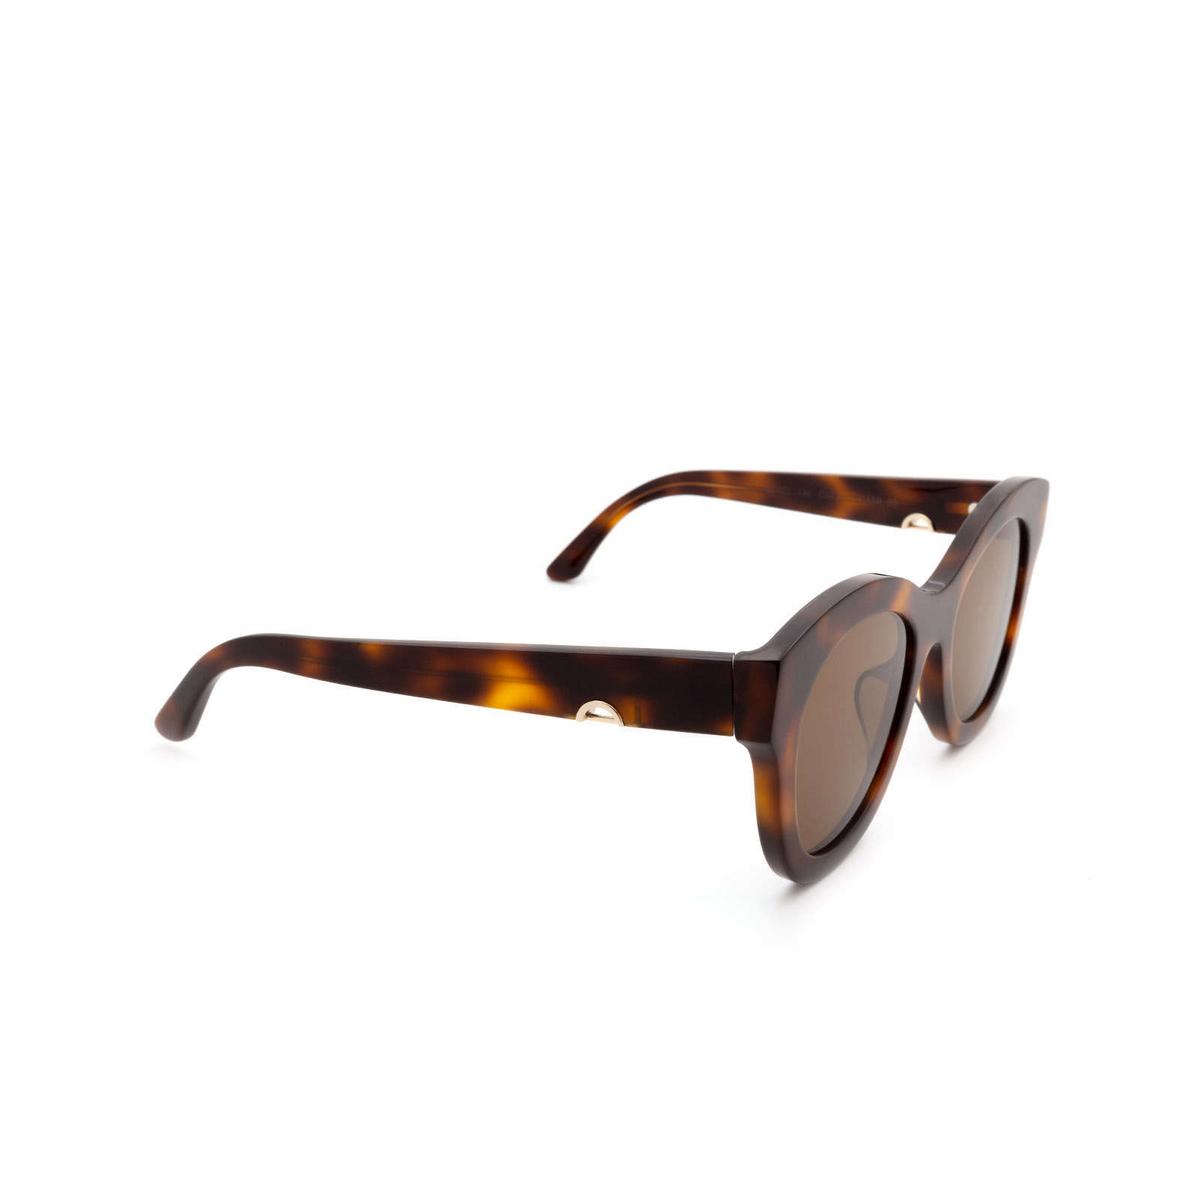 Huma® Butterfly Sunglasses: Cami color Havana 00 - three-quarters view.